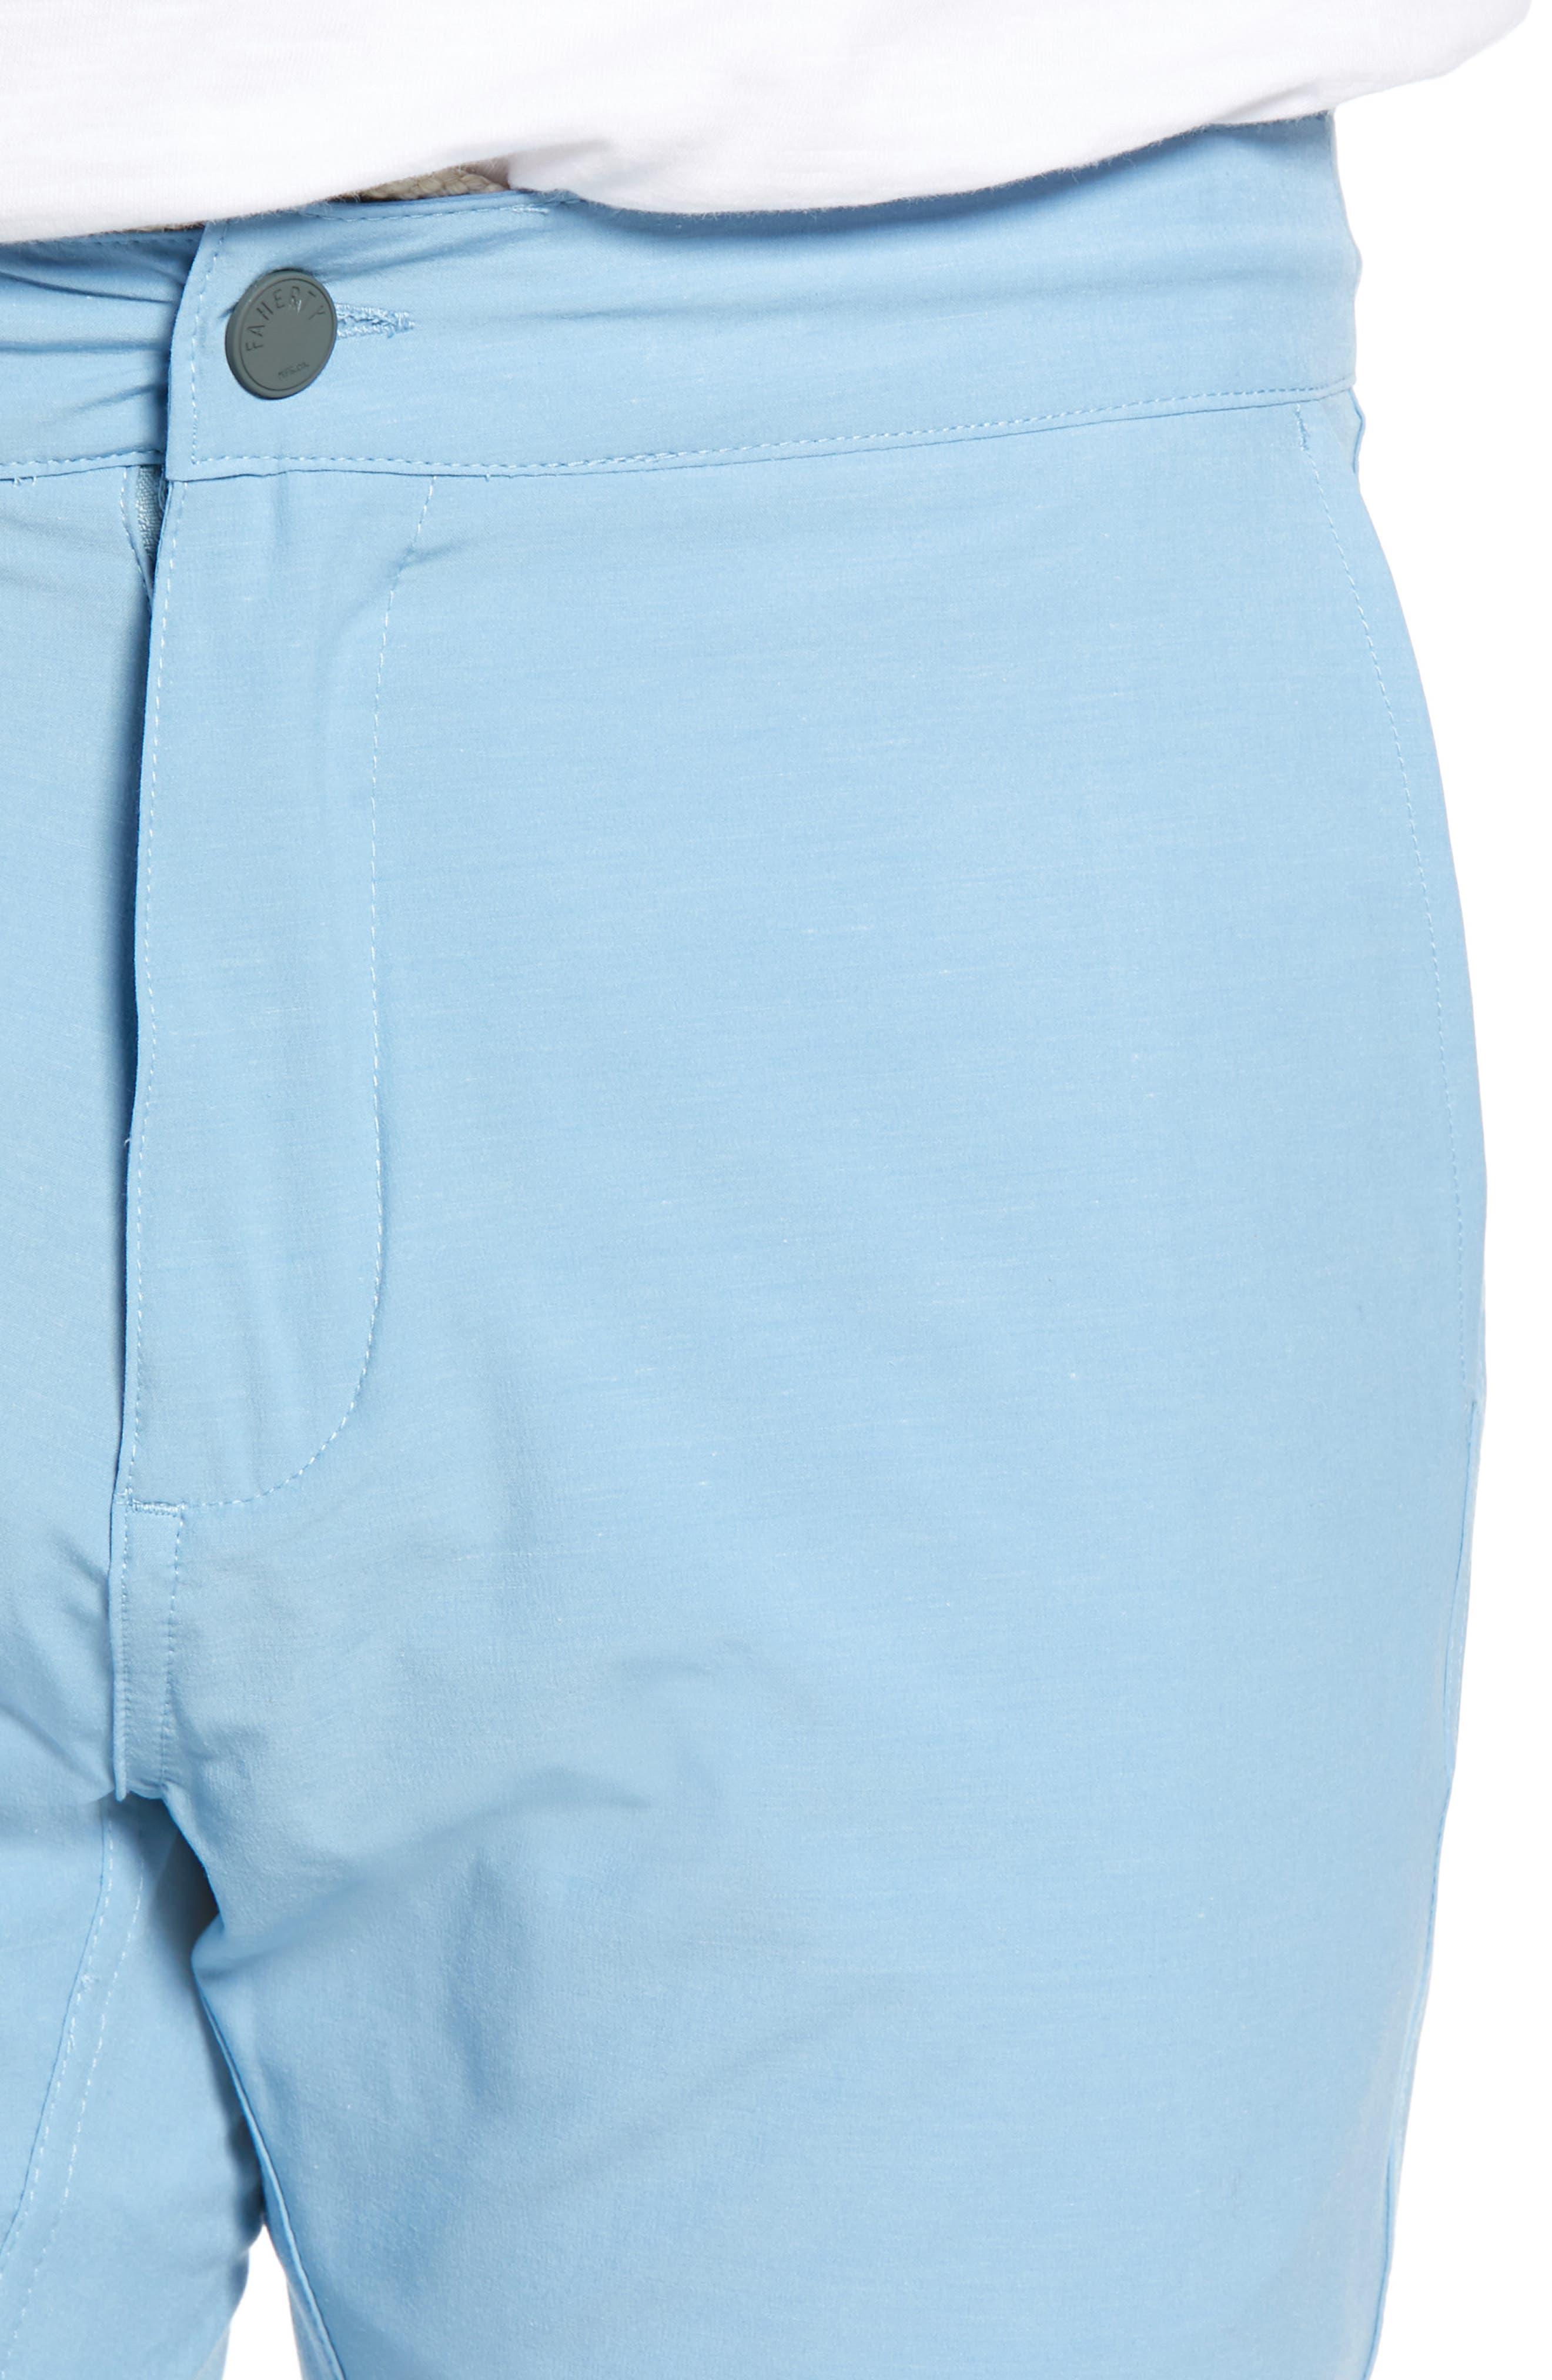 All Day Flat Front Shorts,                             Alternate thumbnail 4, color,                             COASTAL BLUE